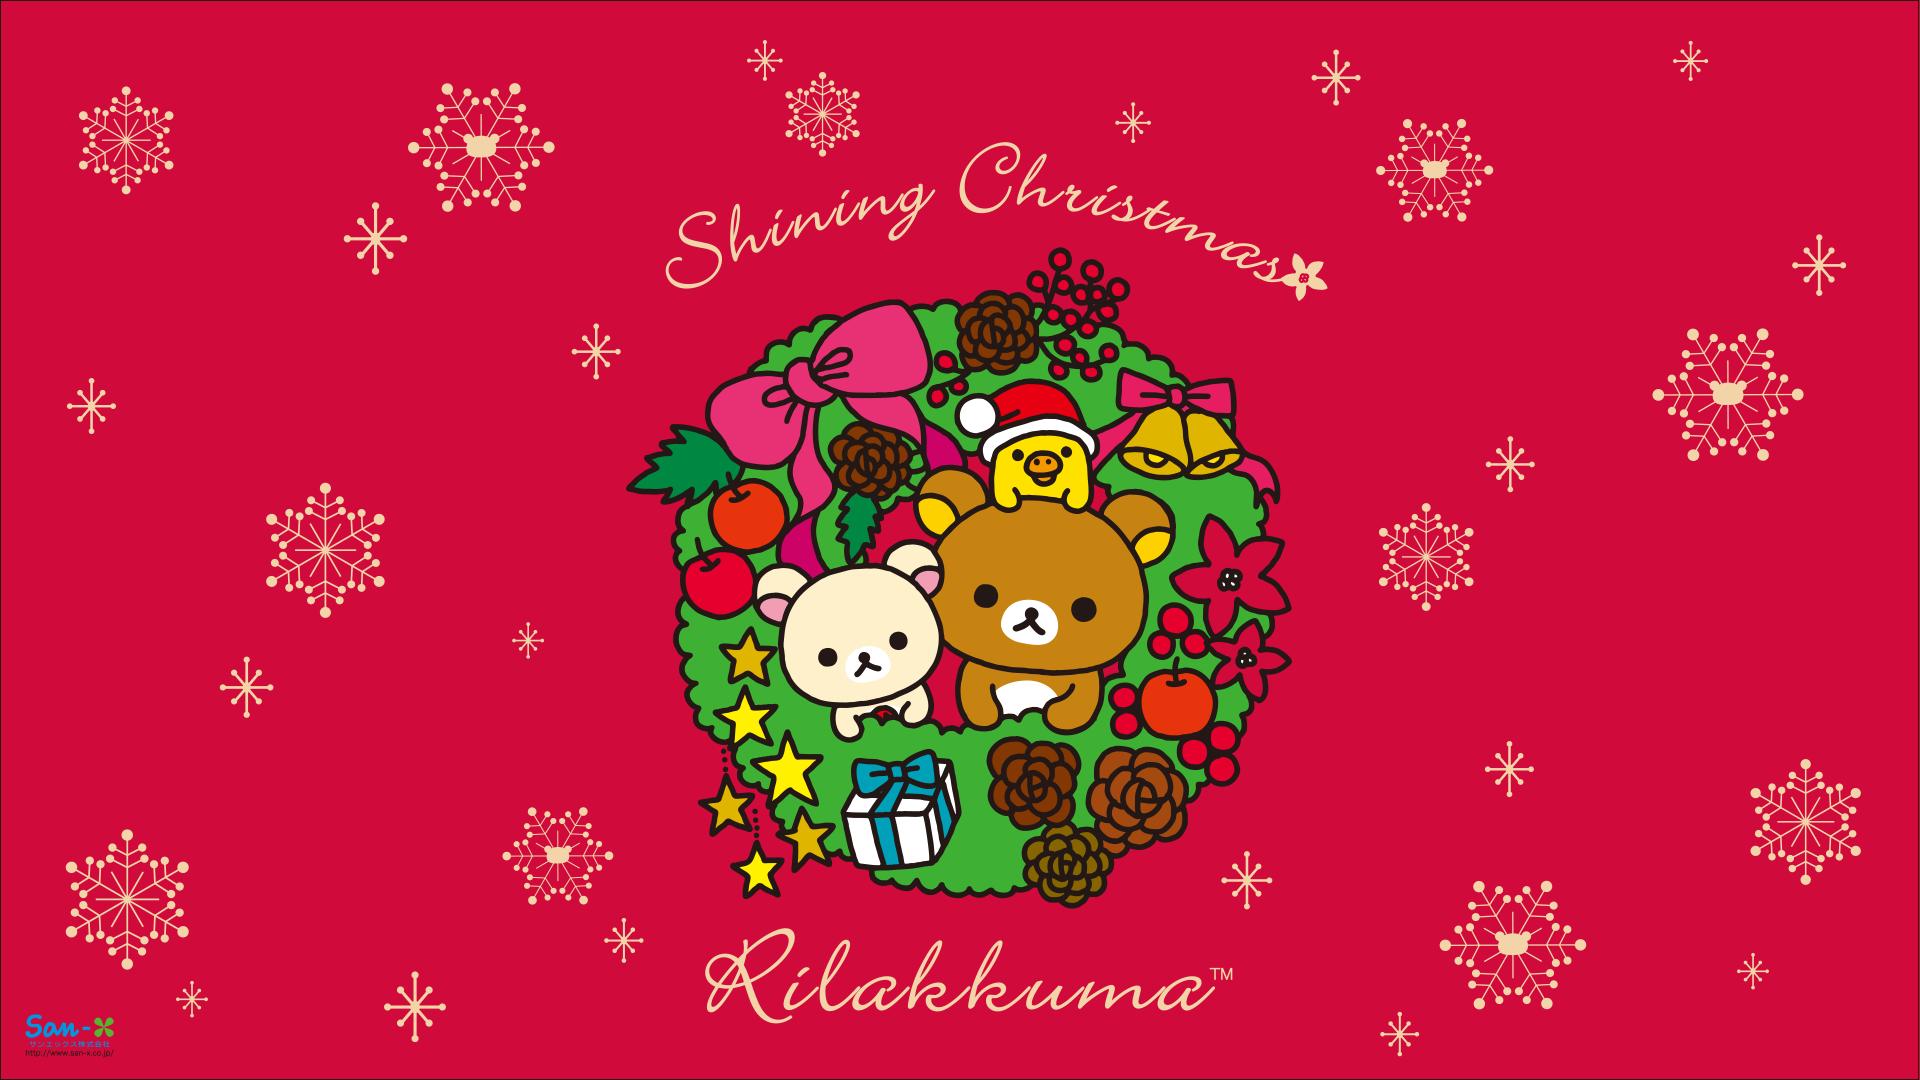 New 2015 Rilakkuma Christmas Wallpaper | Photography <3 ...